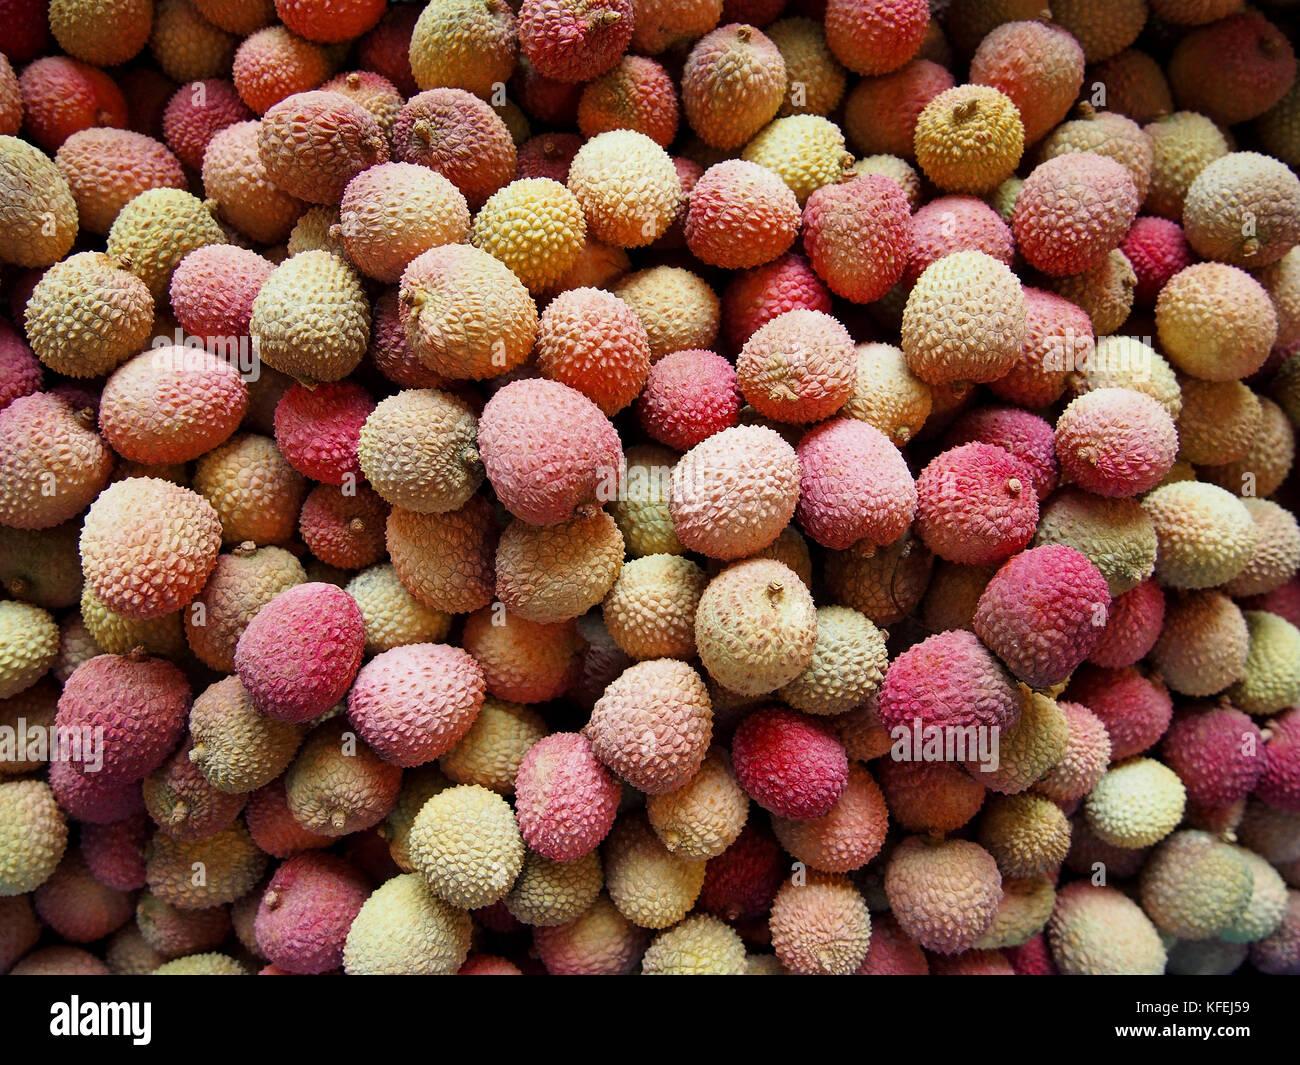 Litchi chinensis fruit close up shot in basket - Stock Image